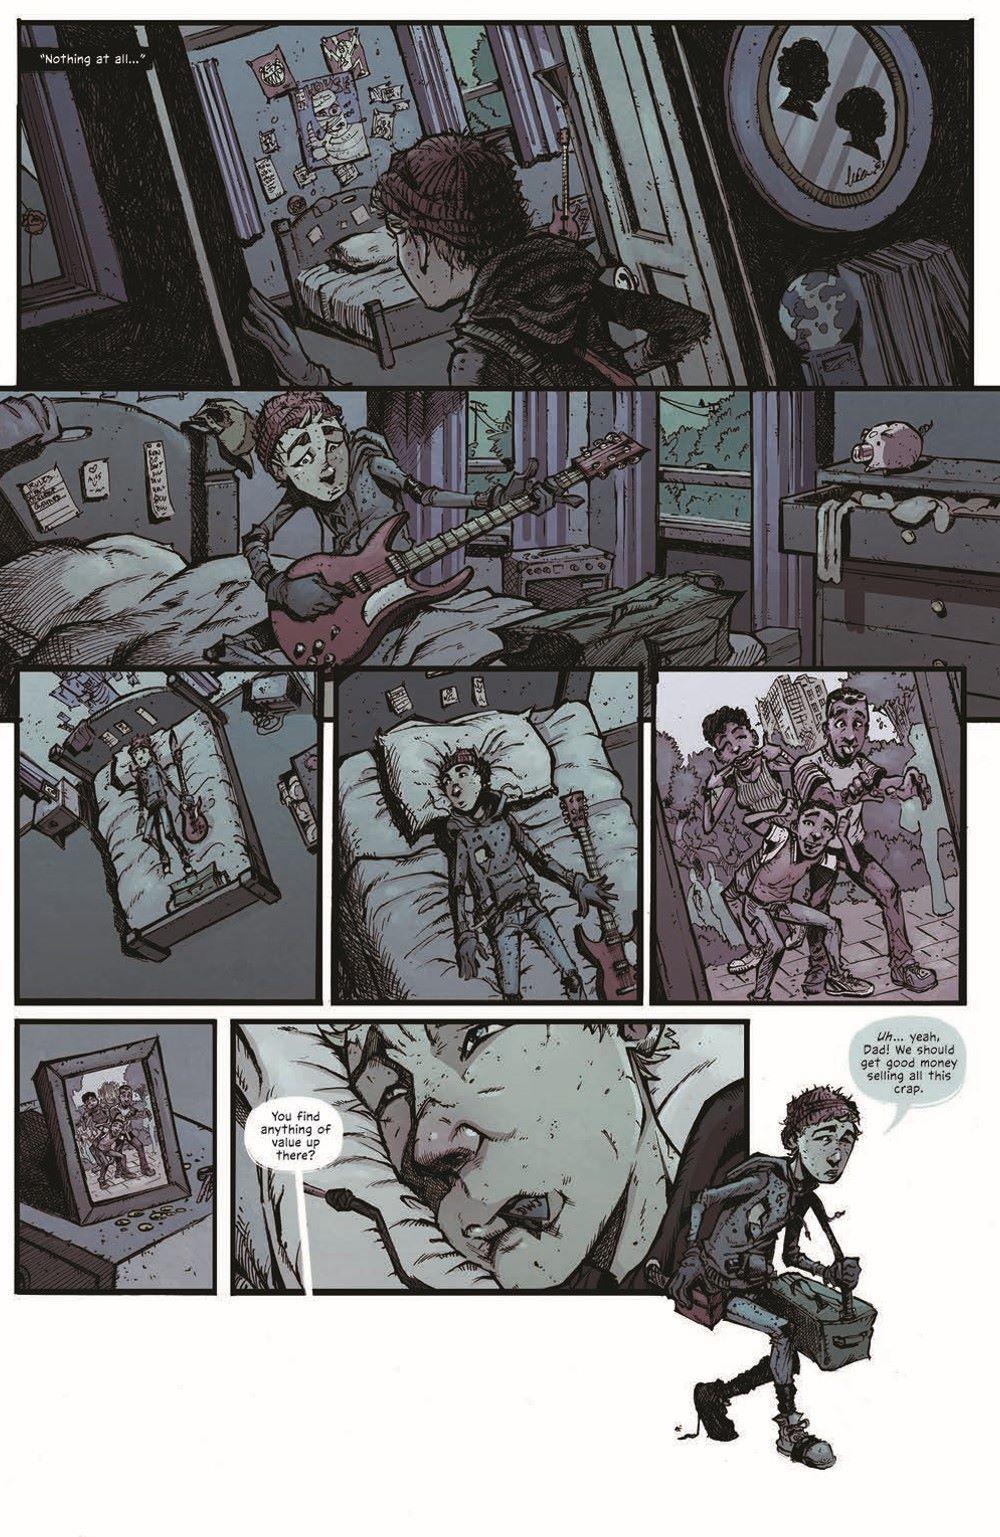 MTNH-TPB_pr-8 ComicList Previews: MOUNTAINHEAD VOLUME 1 TP